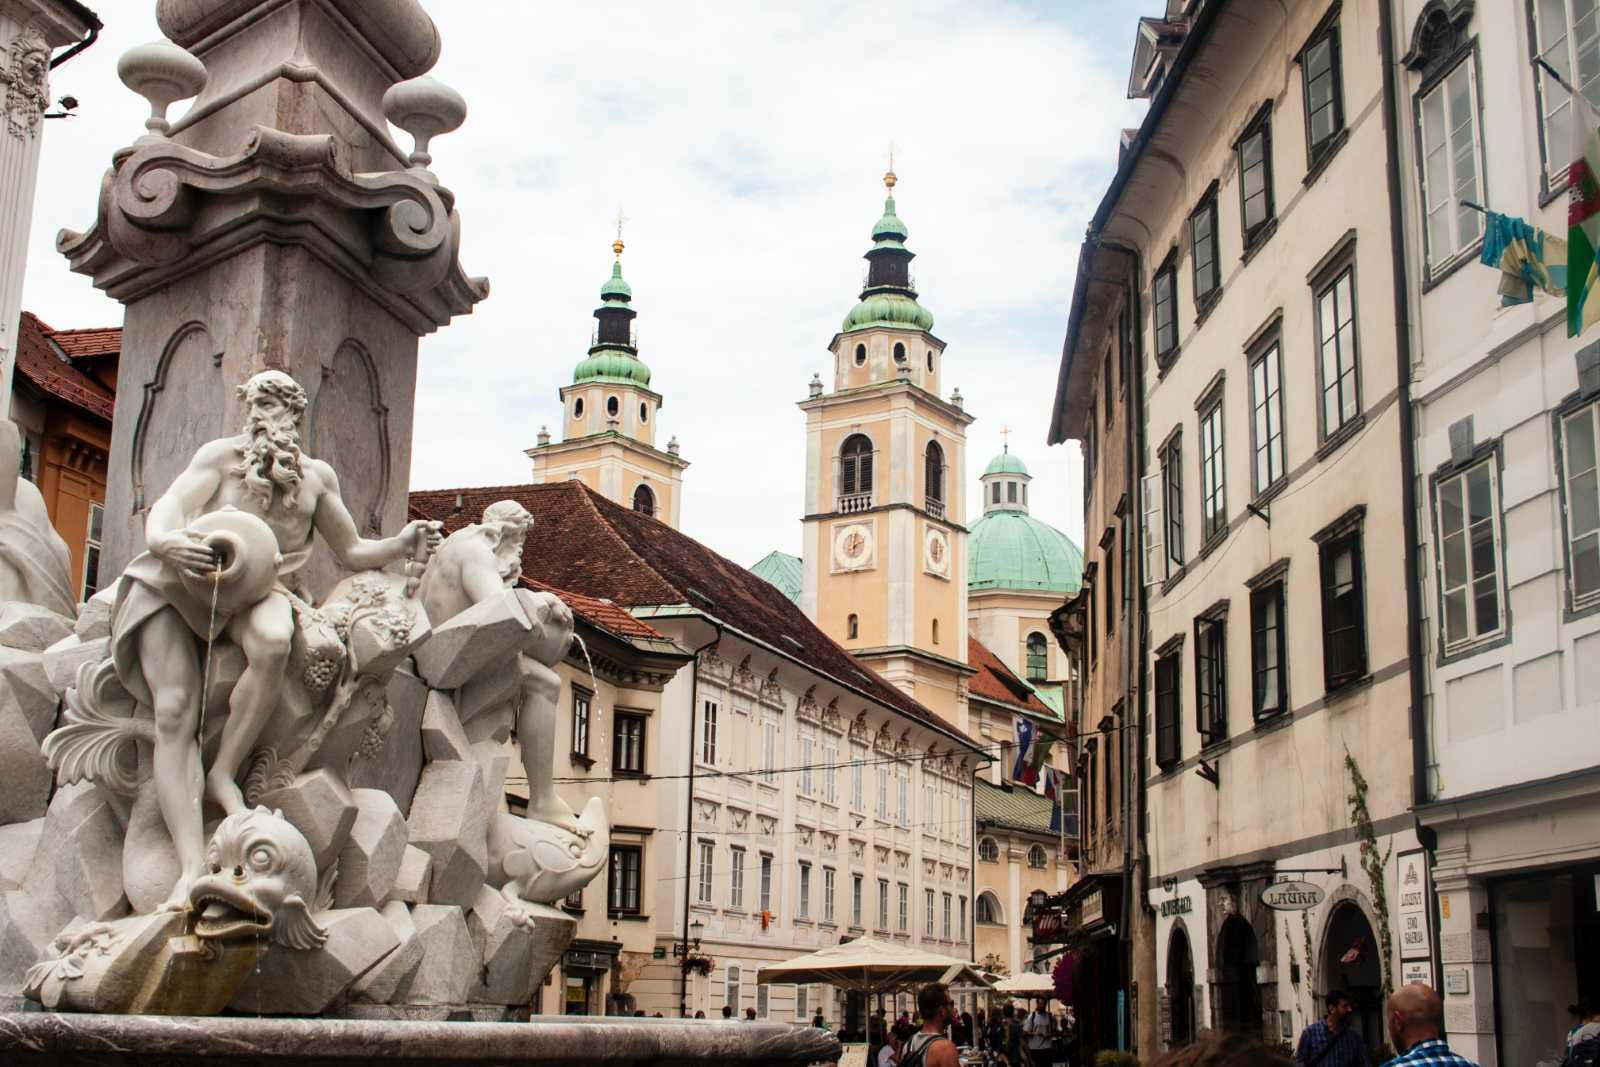 Illusions of Ljubljana image